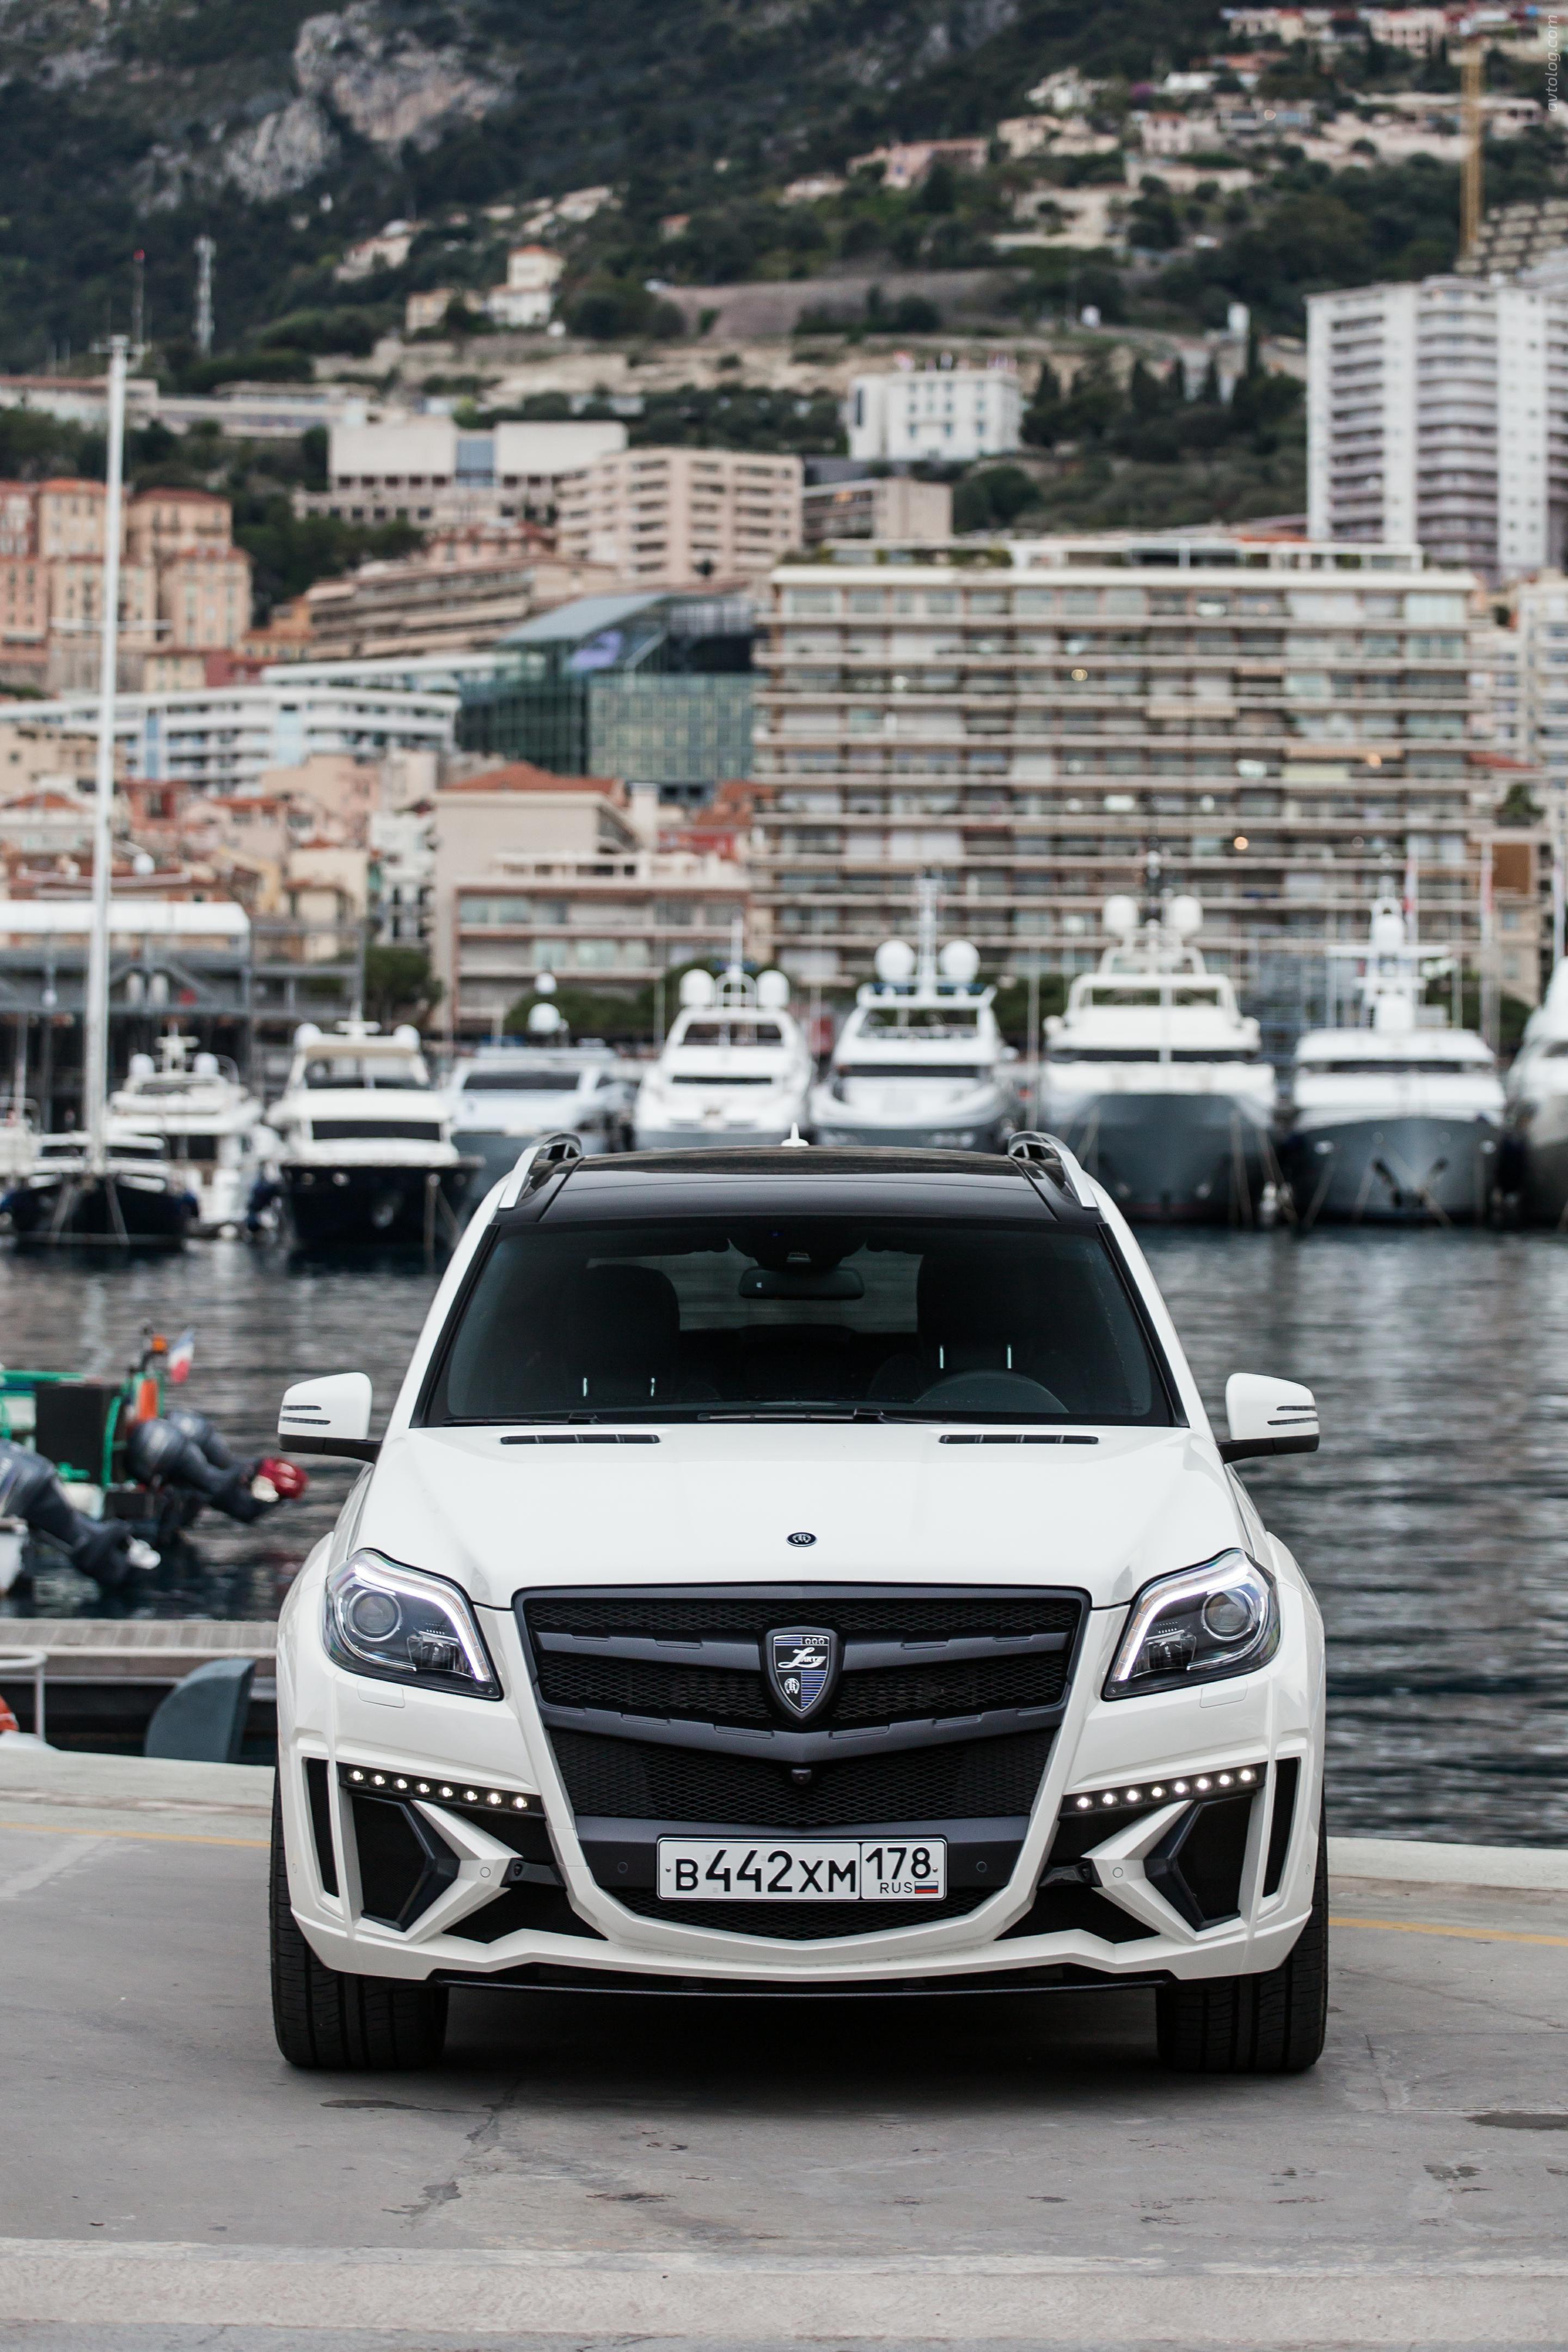 Beau 2015 Larte Design Mercedes Benz GL 63 AMG Black Crystal #Segment_J  #Larte_Design #